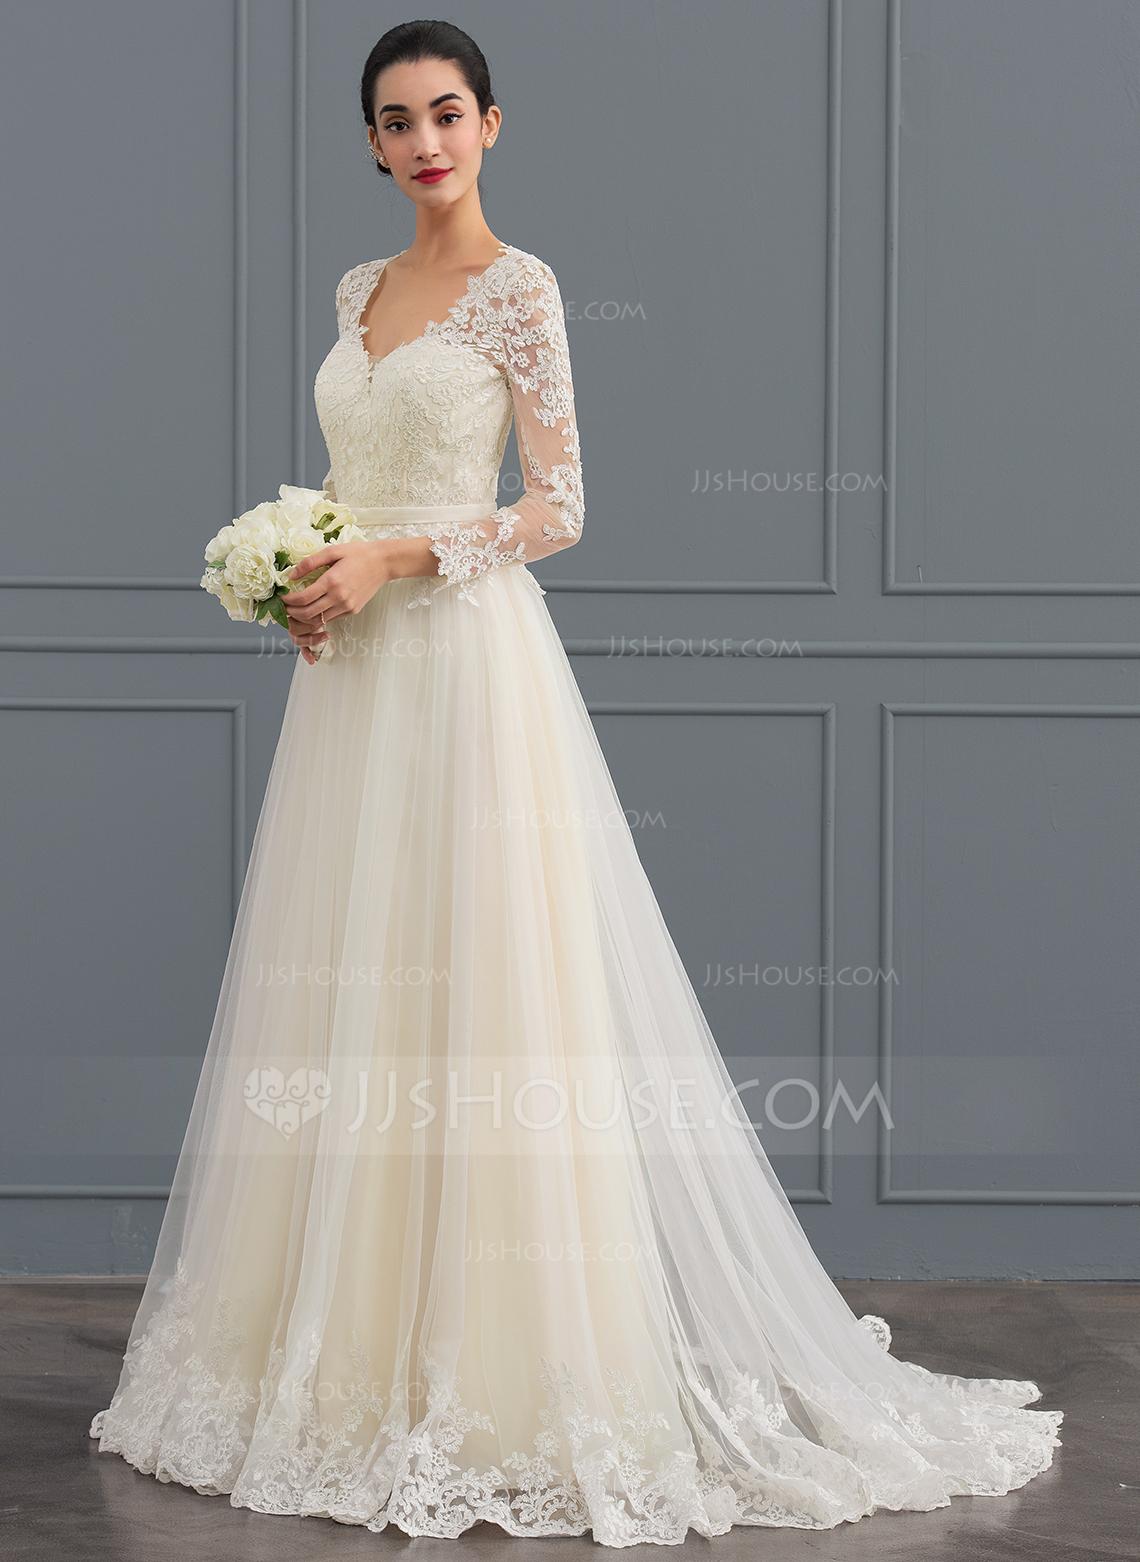 color wedding dresses ball-gown v-neck sweep train tulle wedding dress RKNERFN